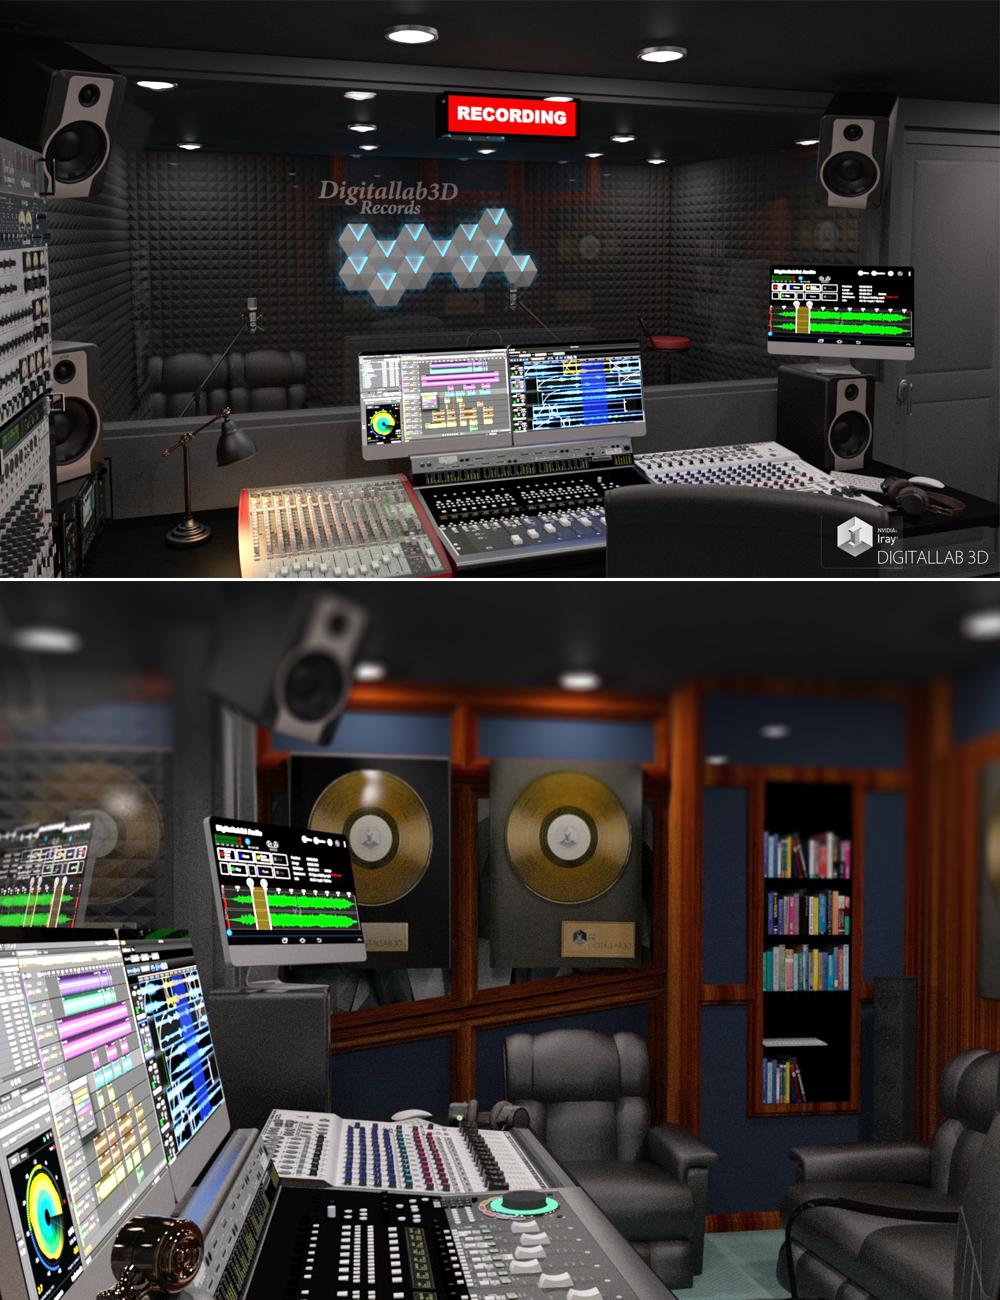 Digitallab3D Recording Studio by: Digitallab3D, 3D Models by Daz 3D